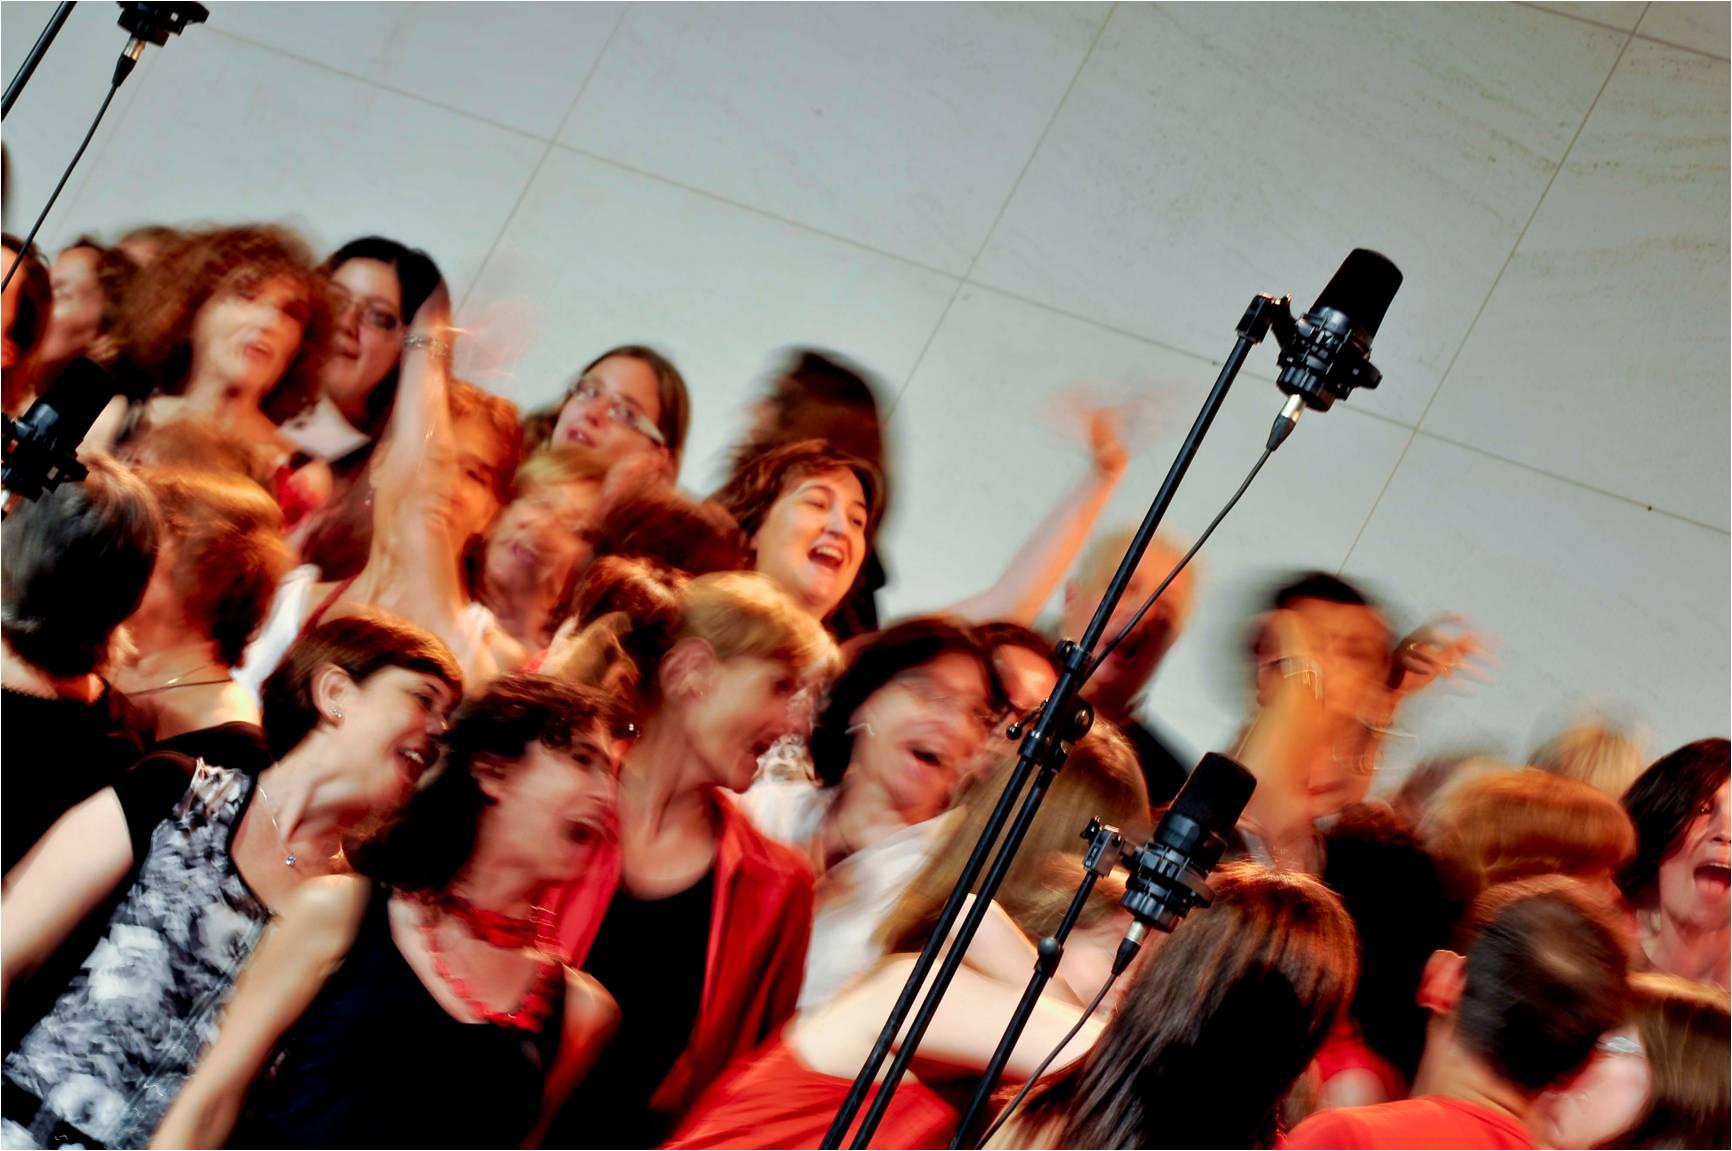 El musical participatiu vuelve al CaixaForum de Barcelona